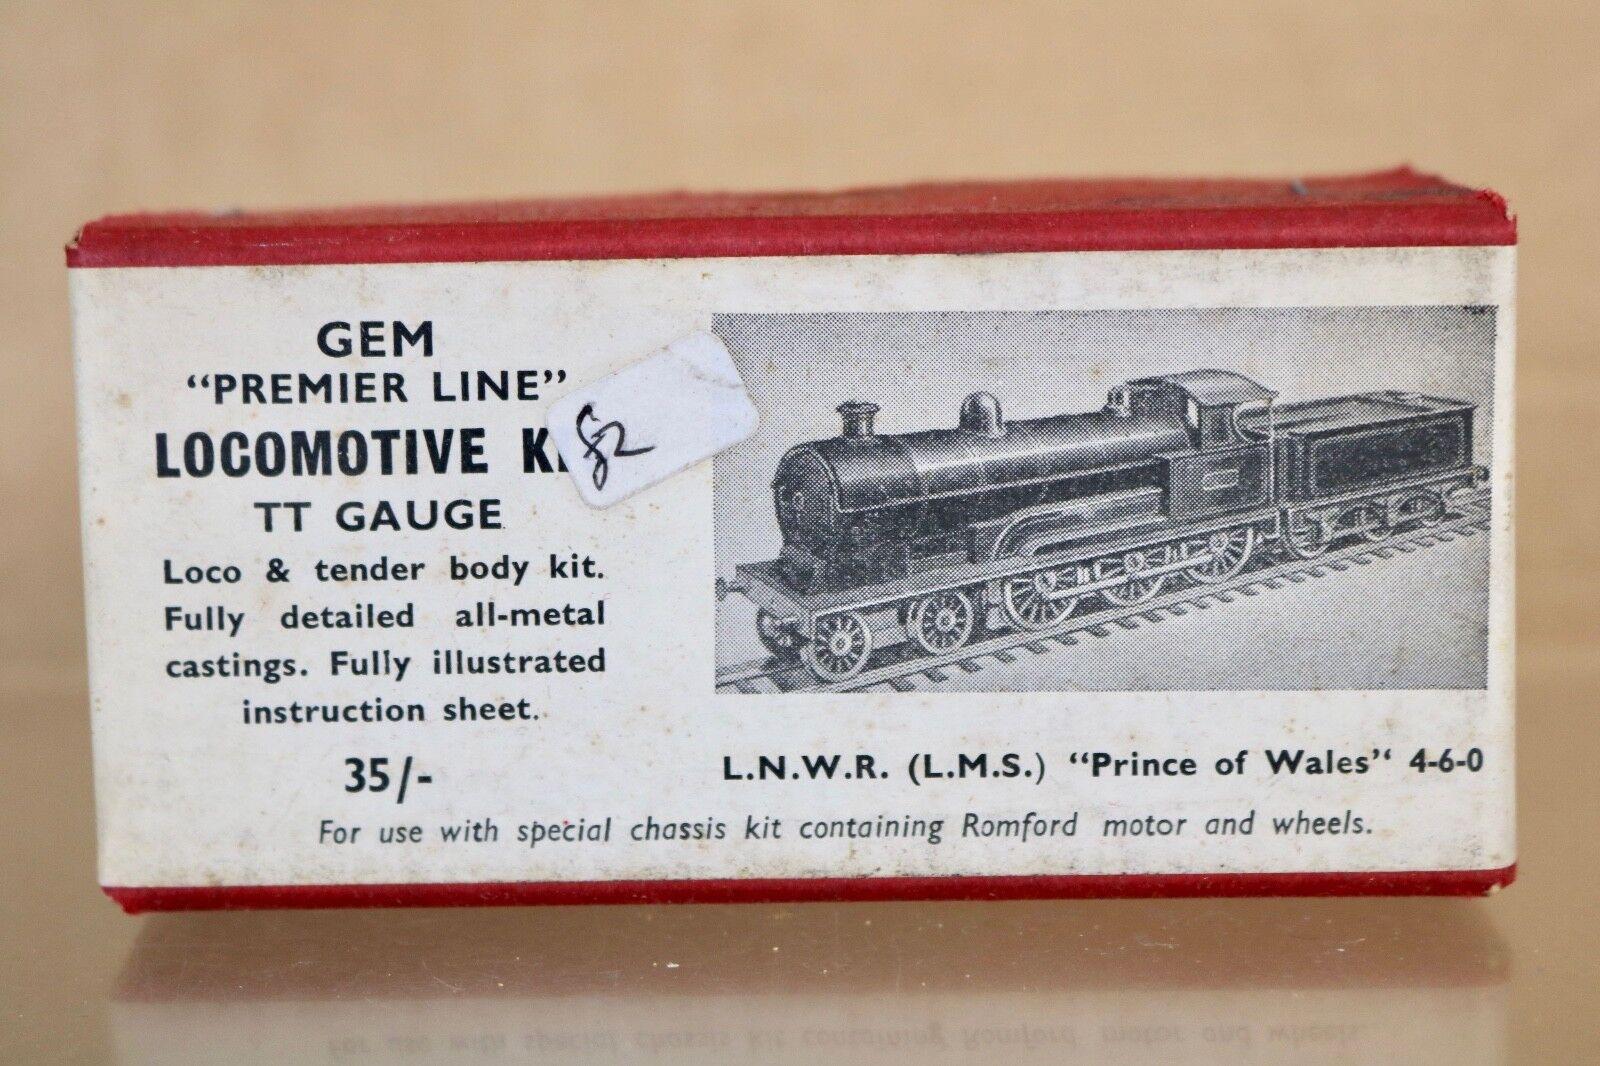 GEM TT GAUGE KIT BUILT LNWR LMS 4-6-0  PRINCE of WALES CLASS LOCOMOTIVE KIT